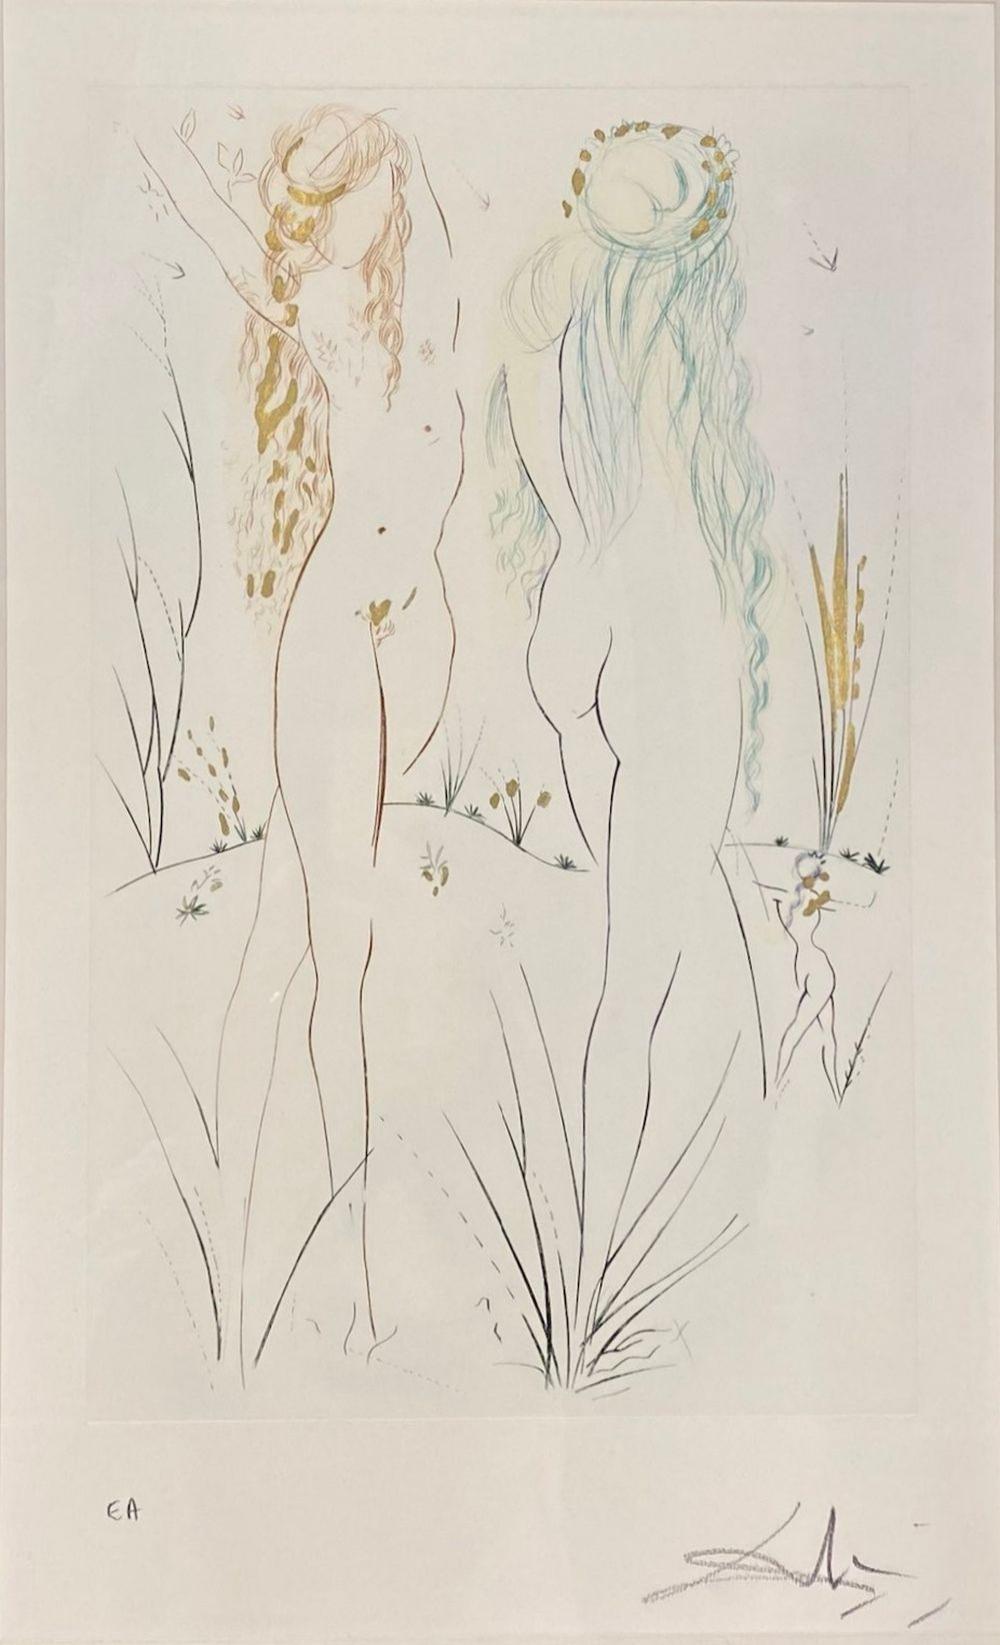 Salvador Dalí - Two Nudes, 1972